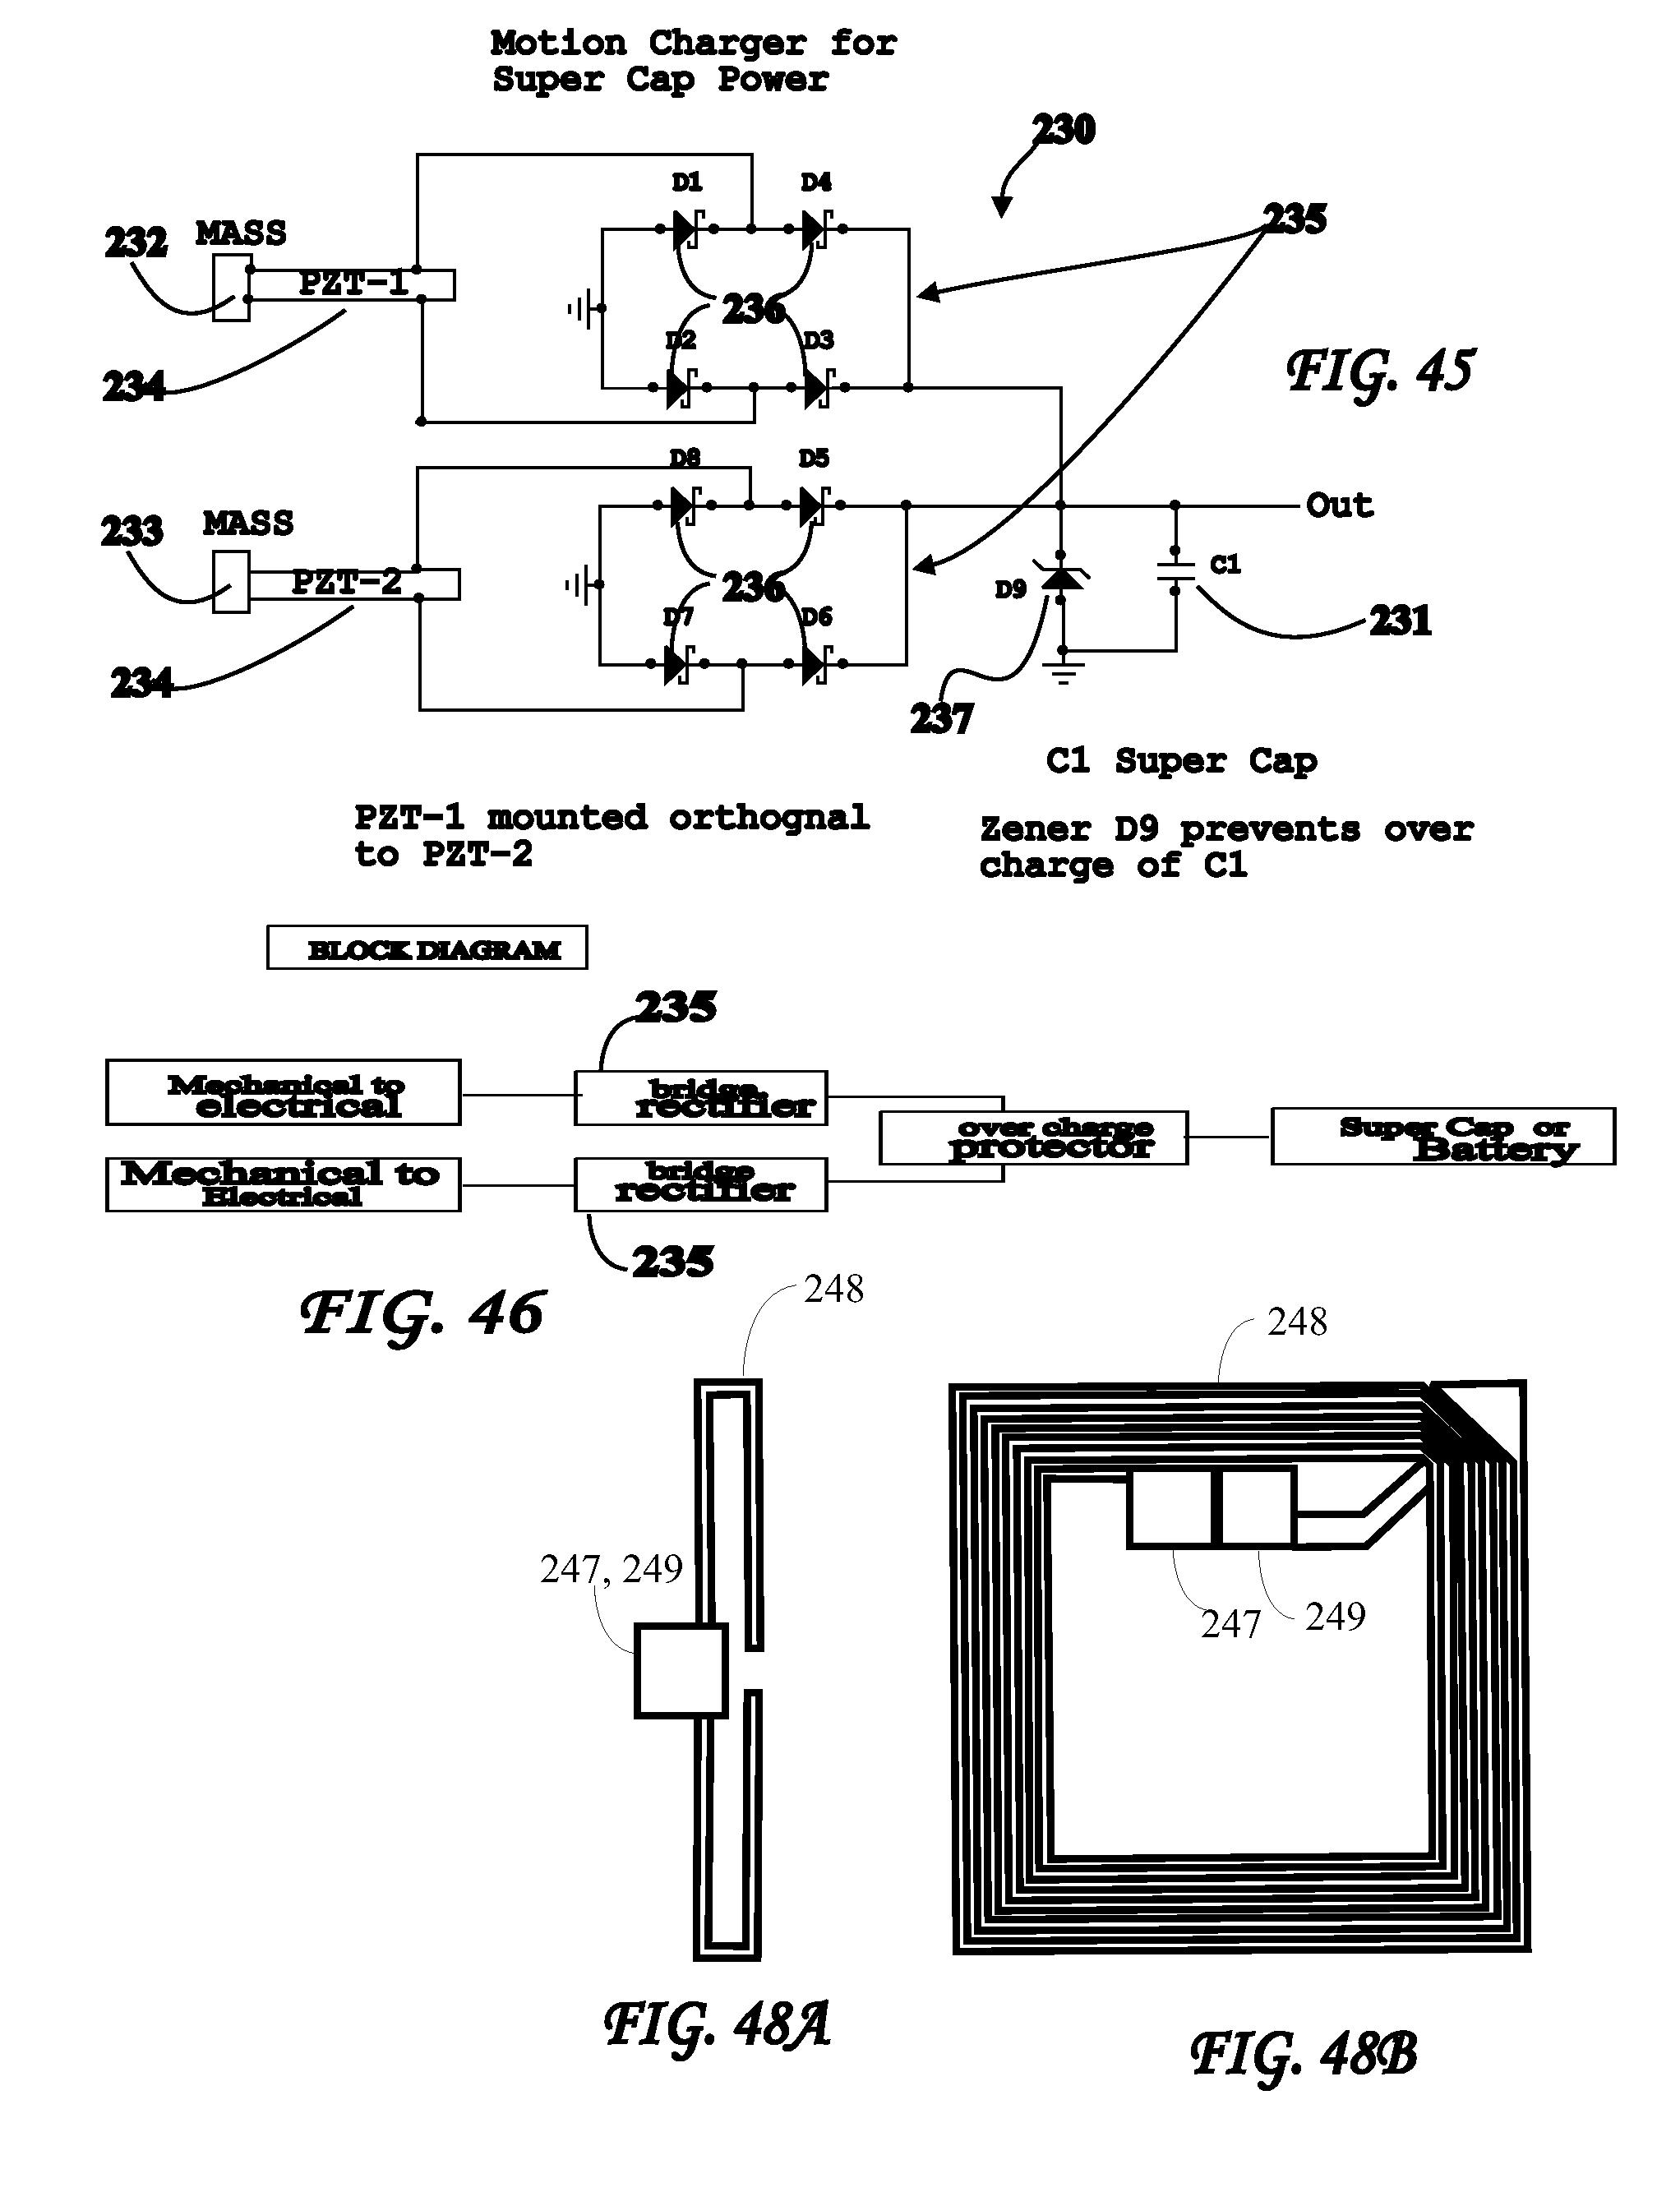 Patent US 7,313,467 B2